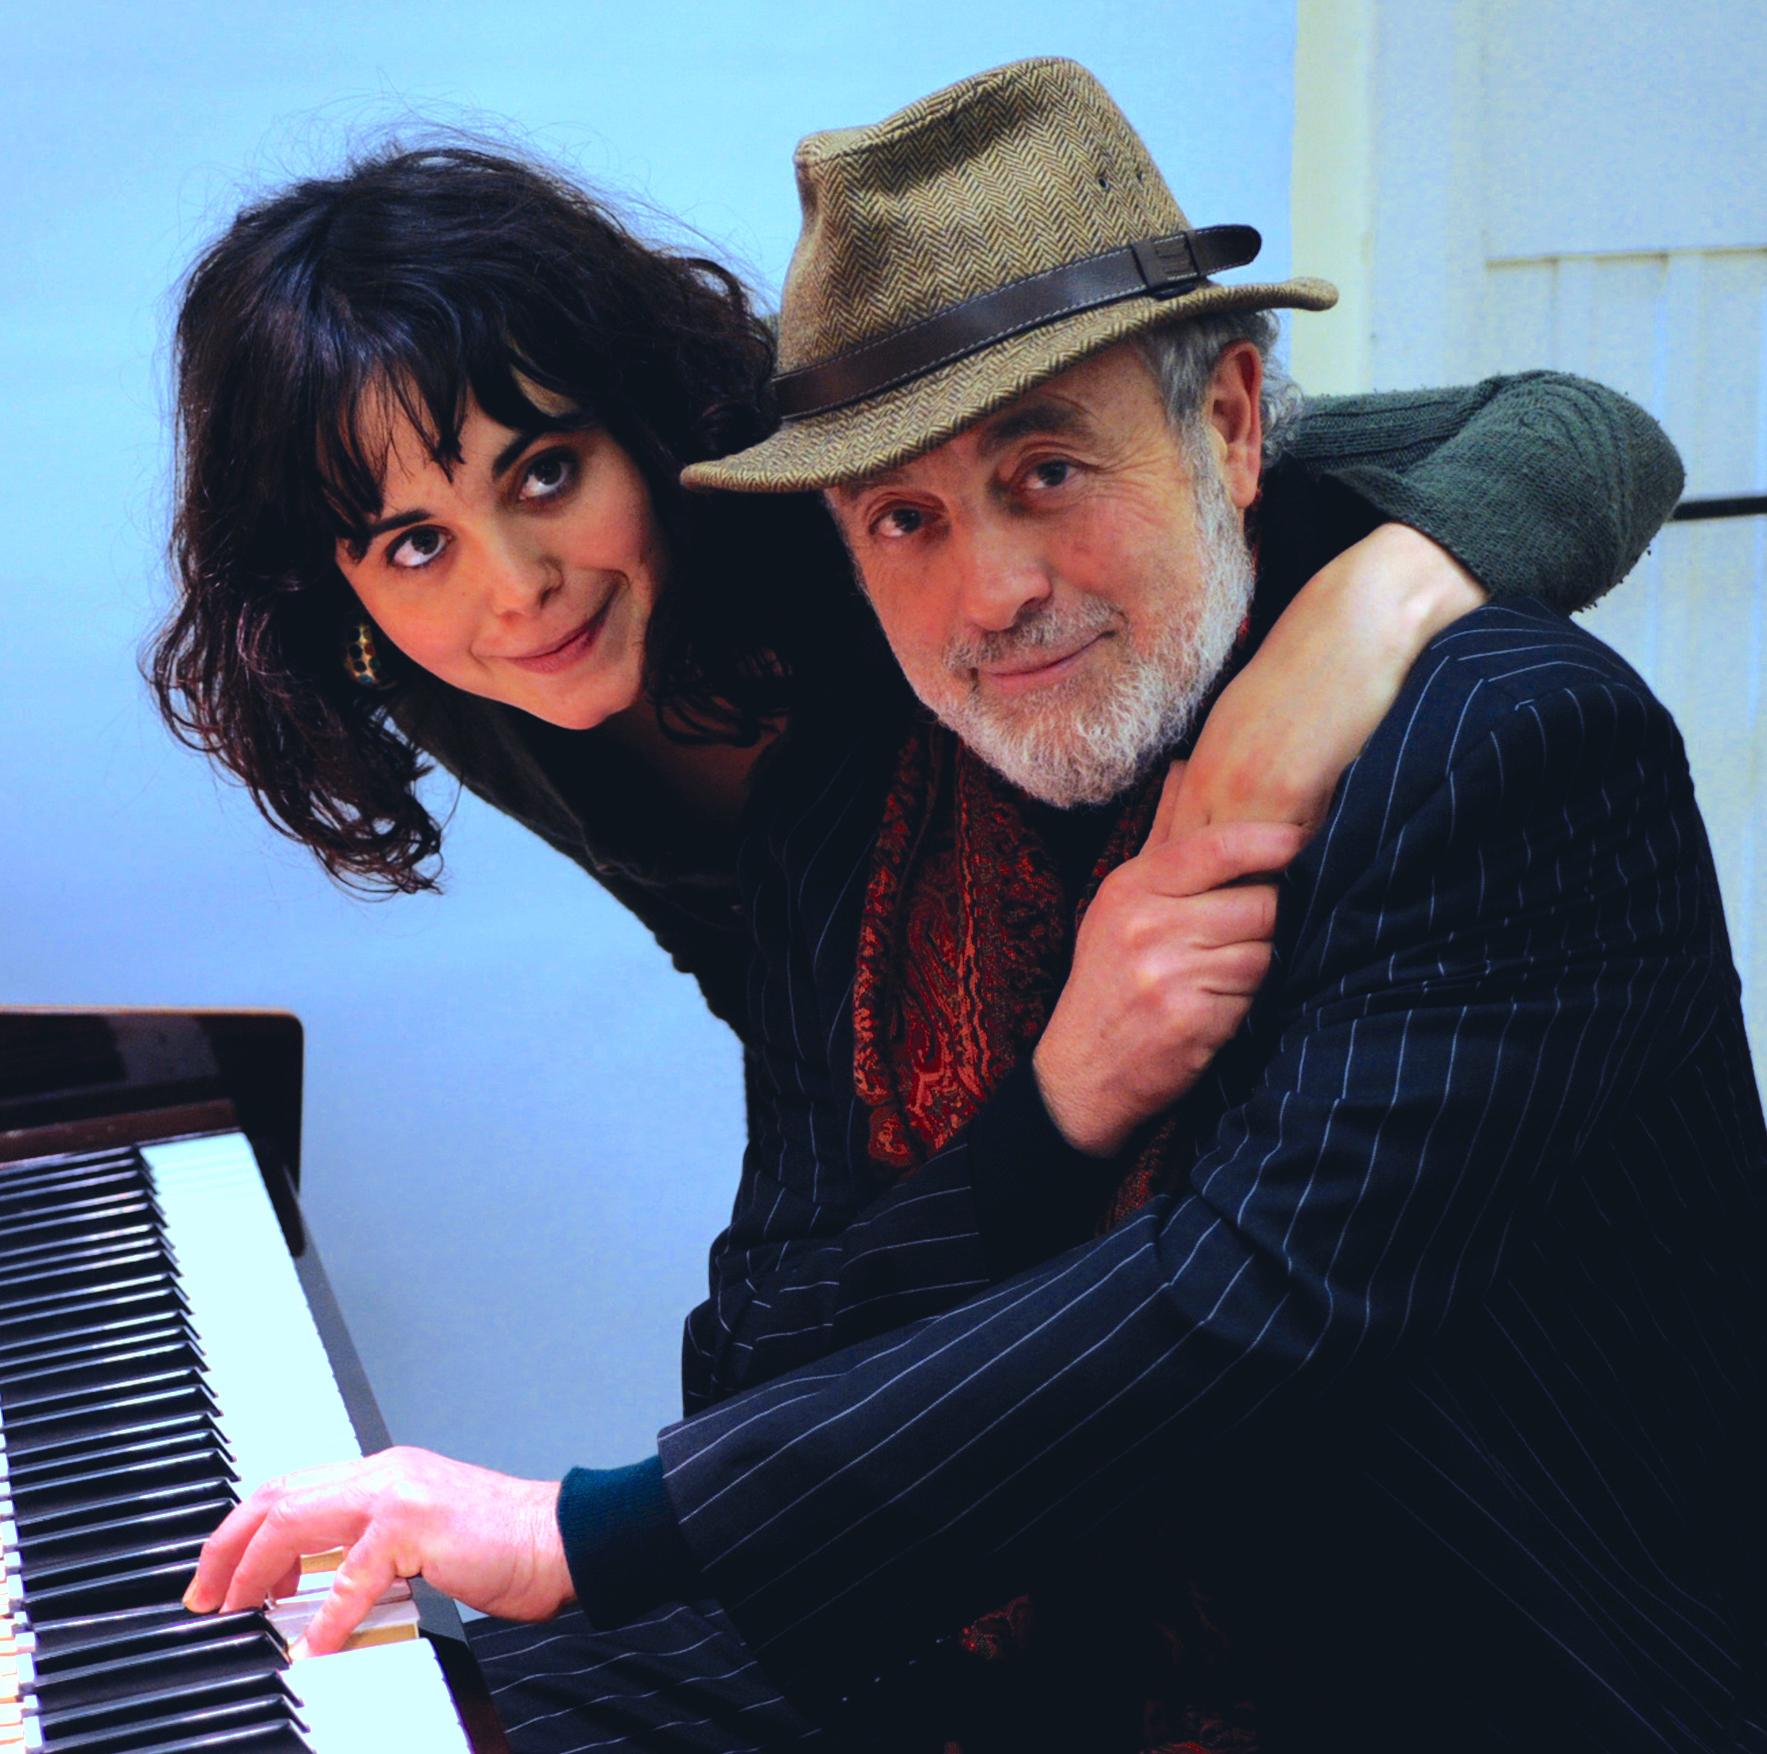 Antoni O' & Consuelo Nerea